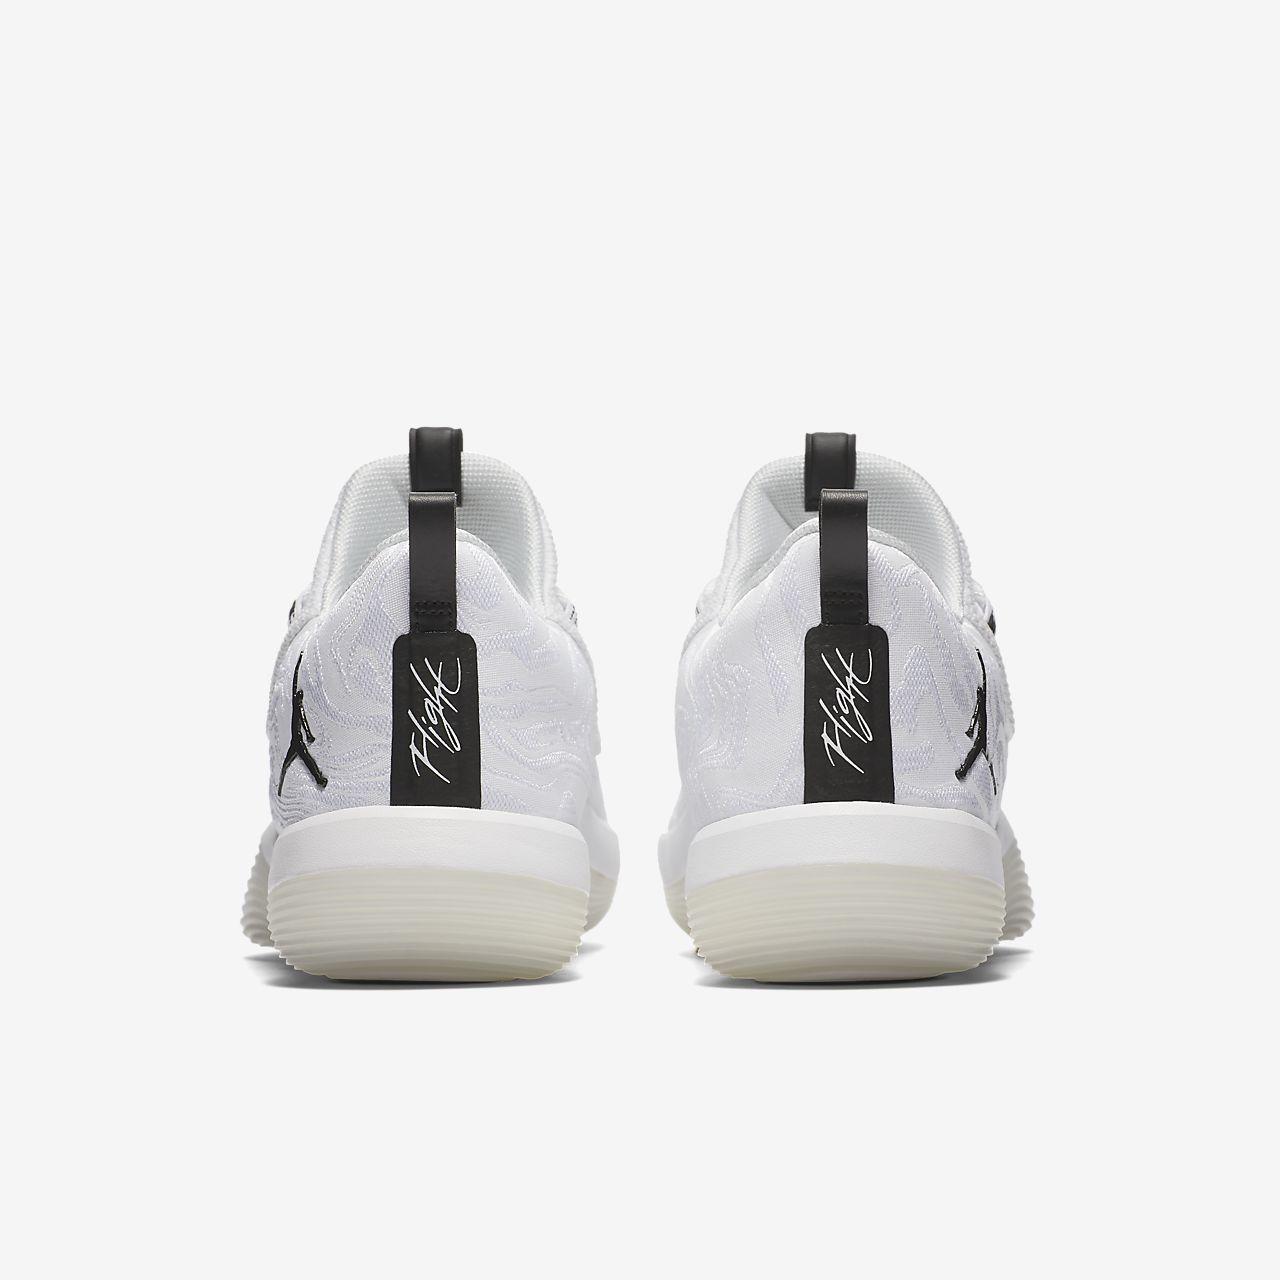 a814968a547 Fly 2017 Low Men s Basketball Shoe Jordan Super.Fly 2017 Low Men s  Basketball Shoe